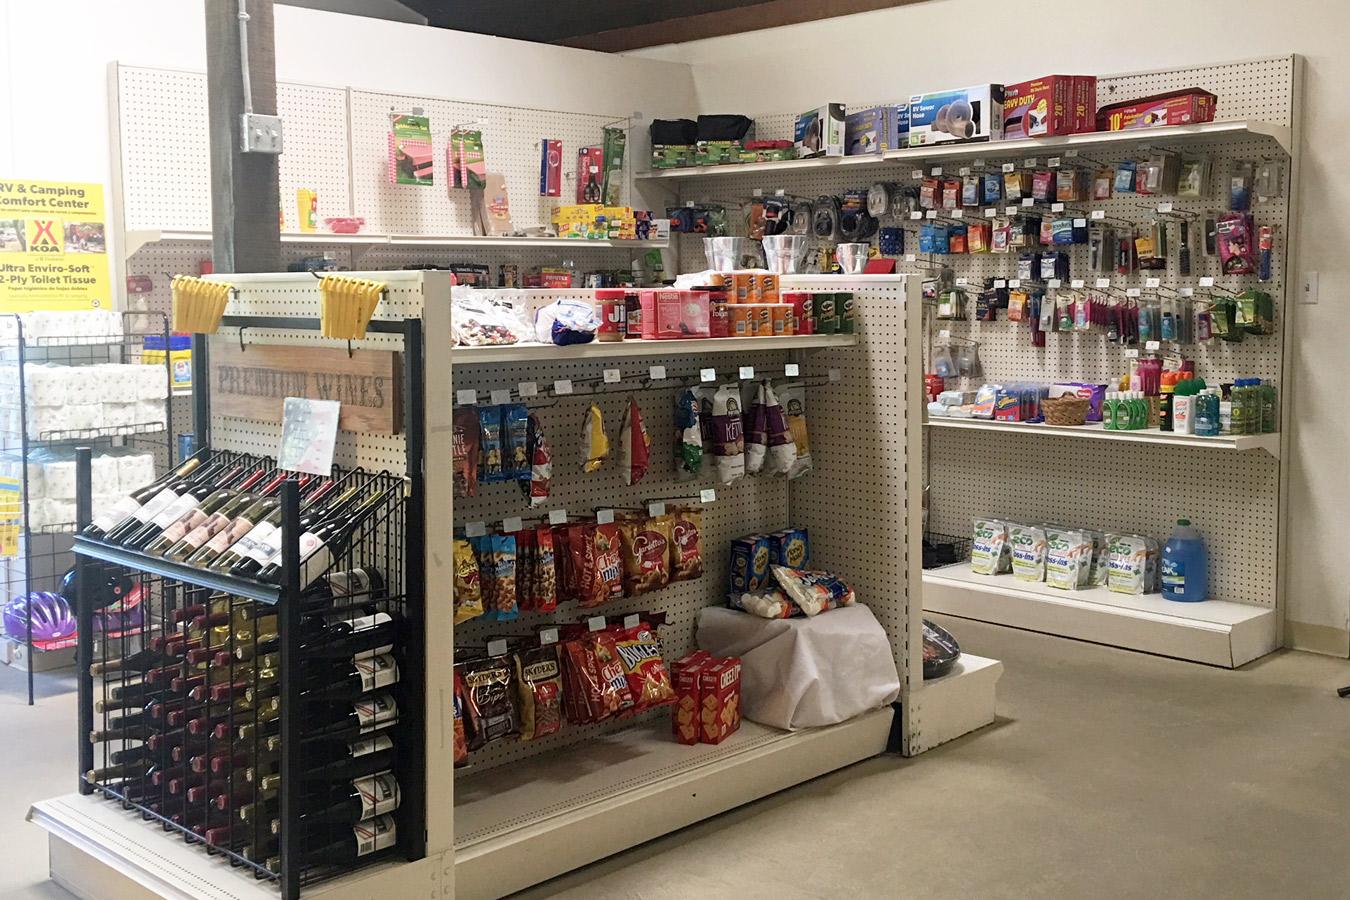 Benbow KOA Mini-Market store shelves